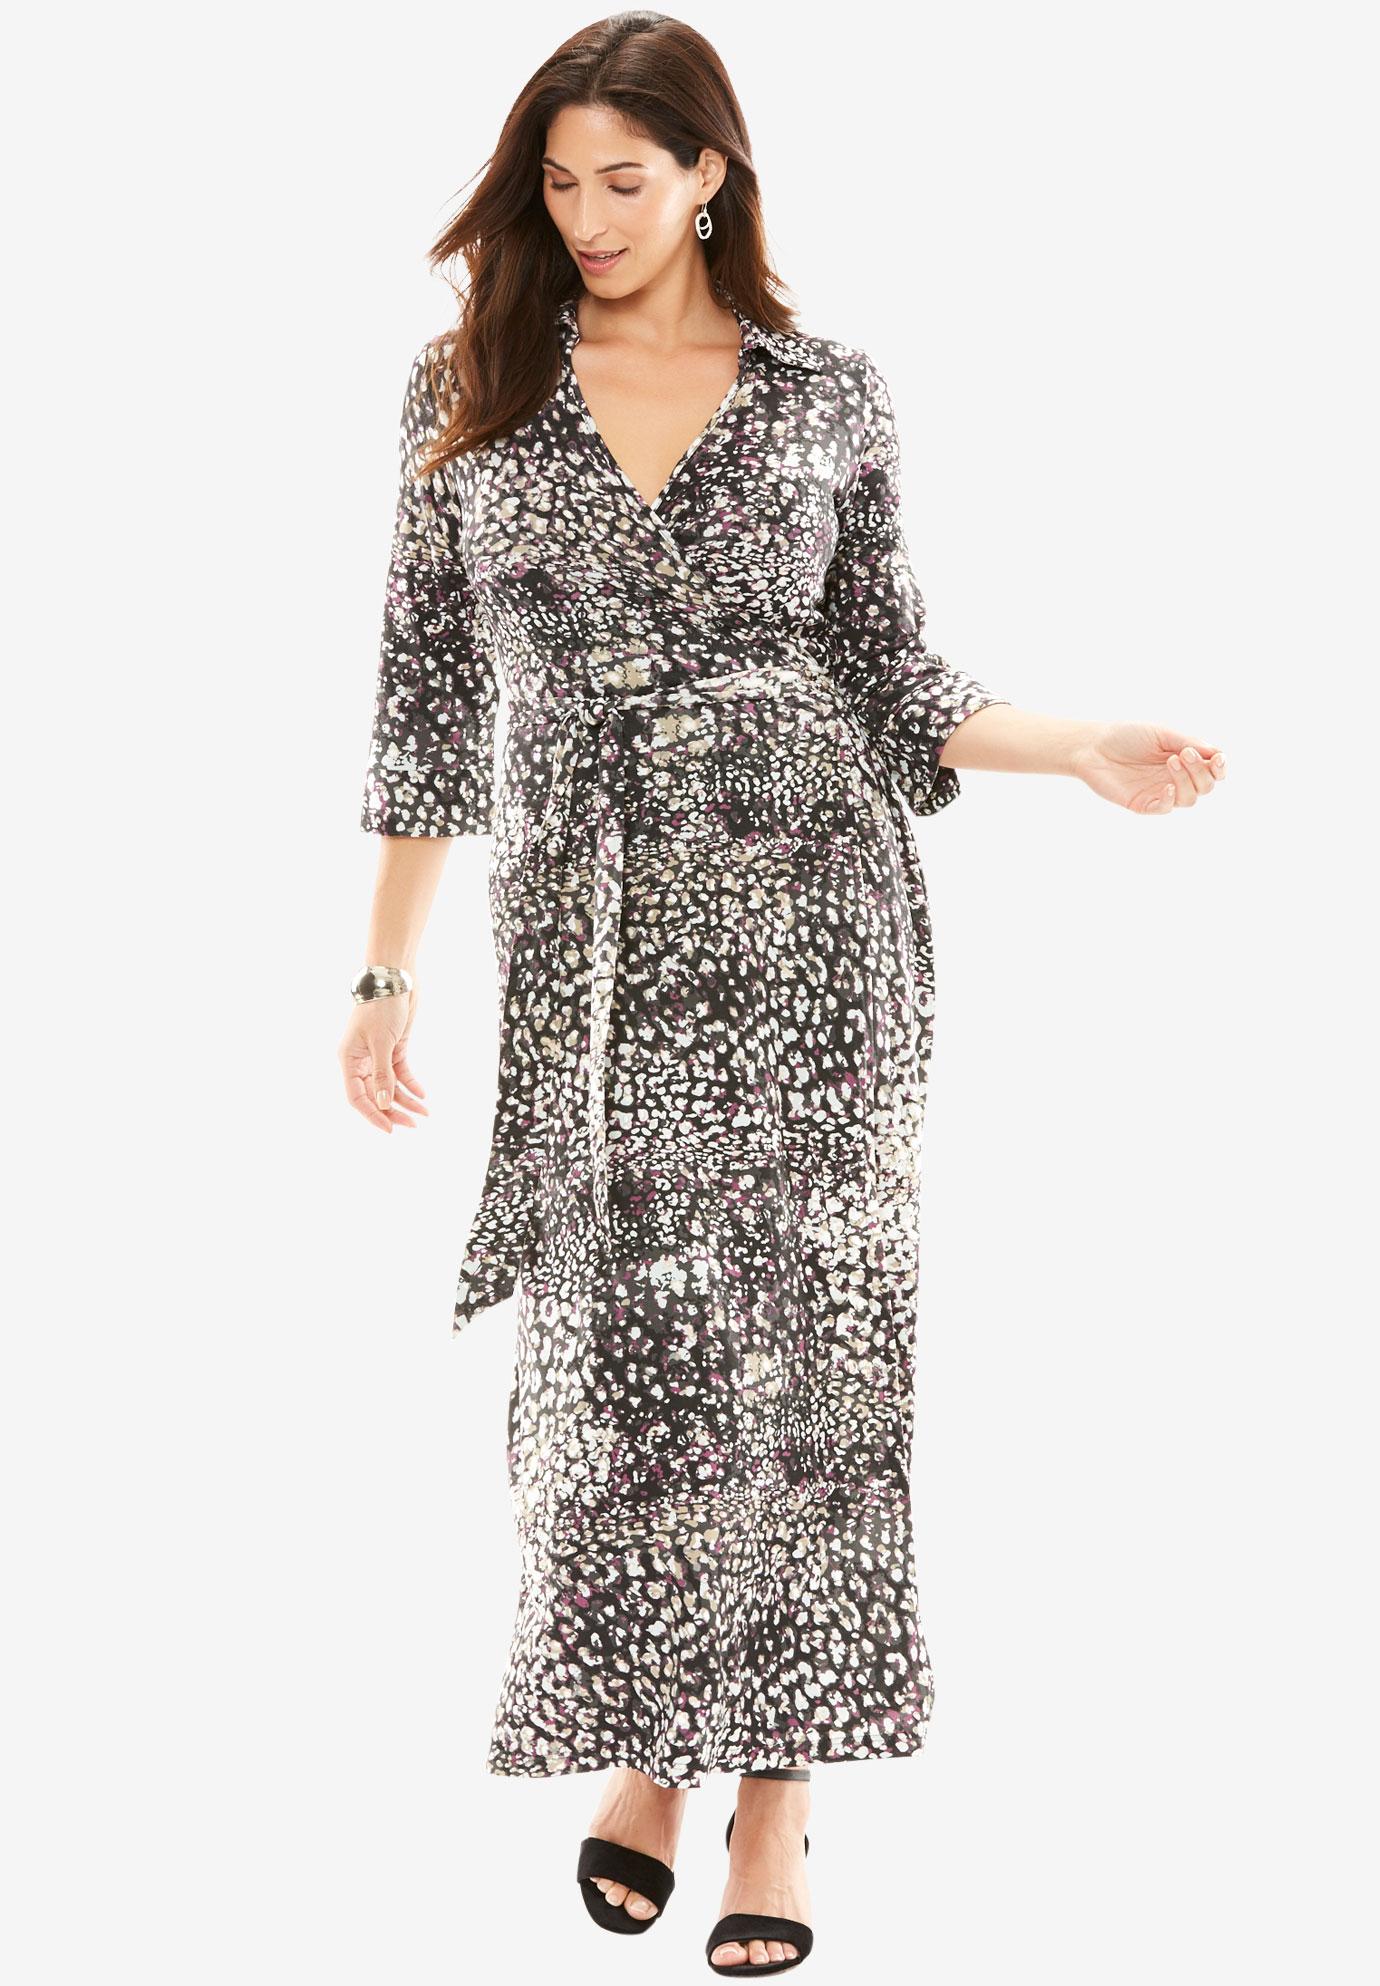 Wrap Style Maxi Dress| Plus Size Maxi Dresses | Jessica London